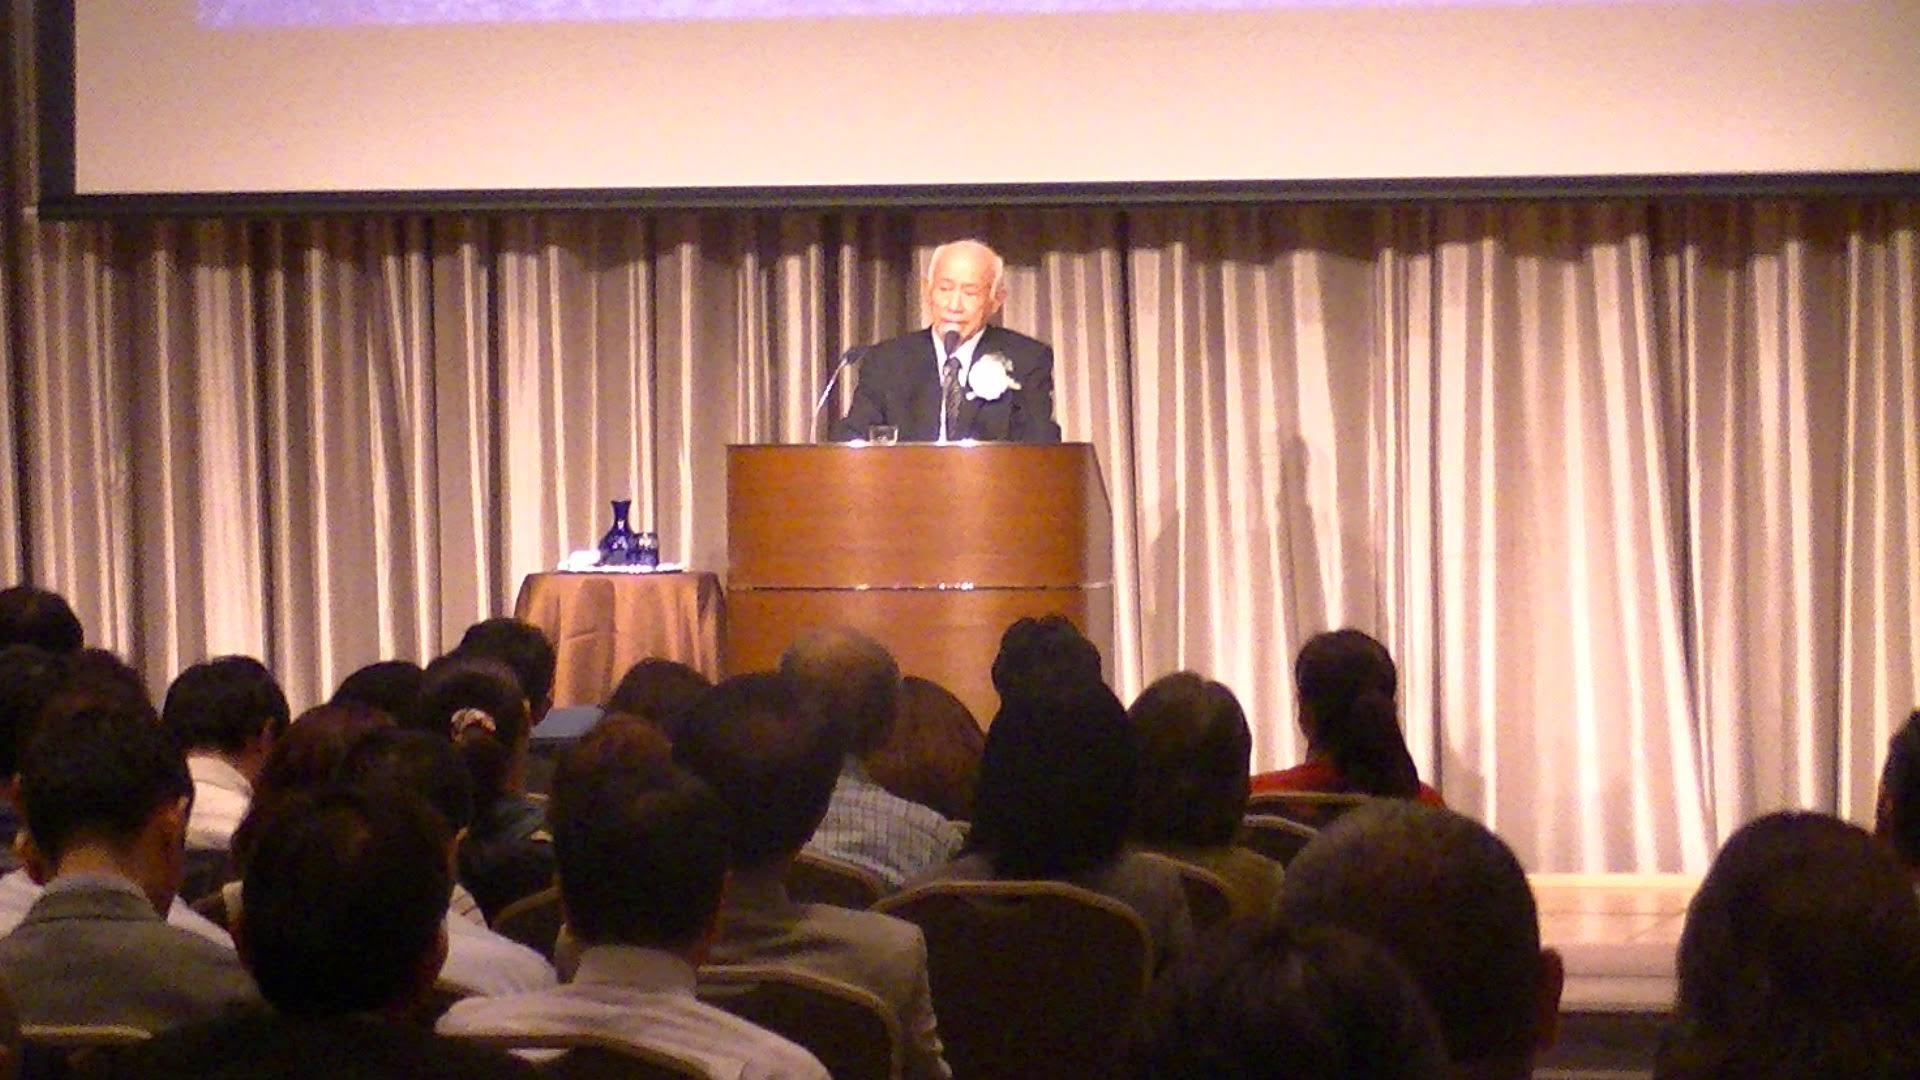 PIC 1714 1 - 思風会全国大会in広島